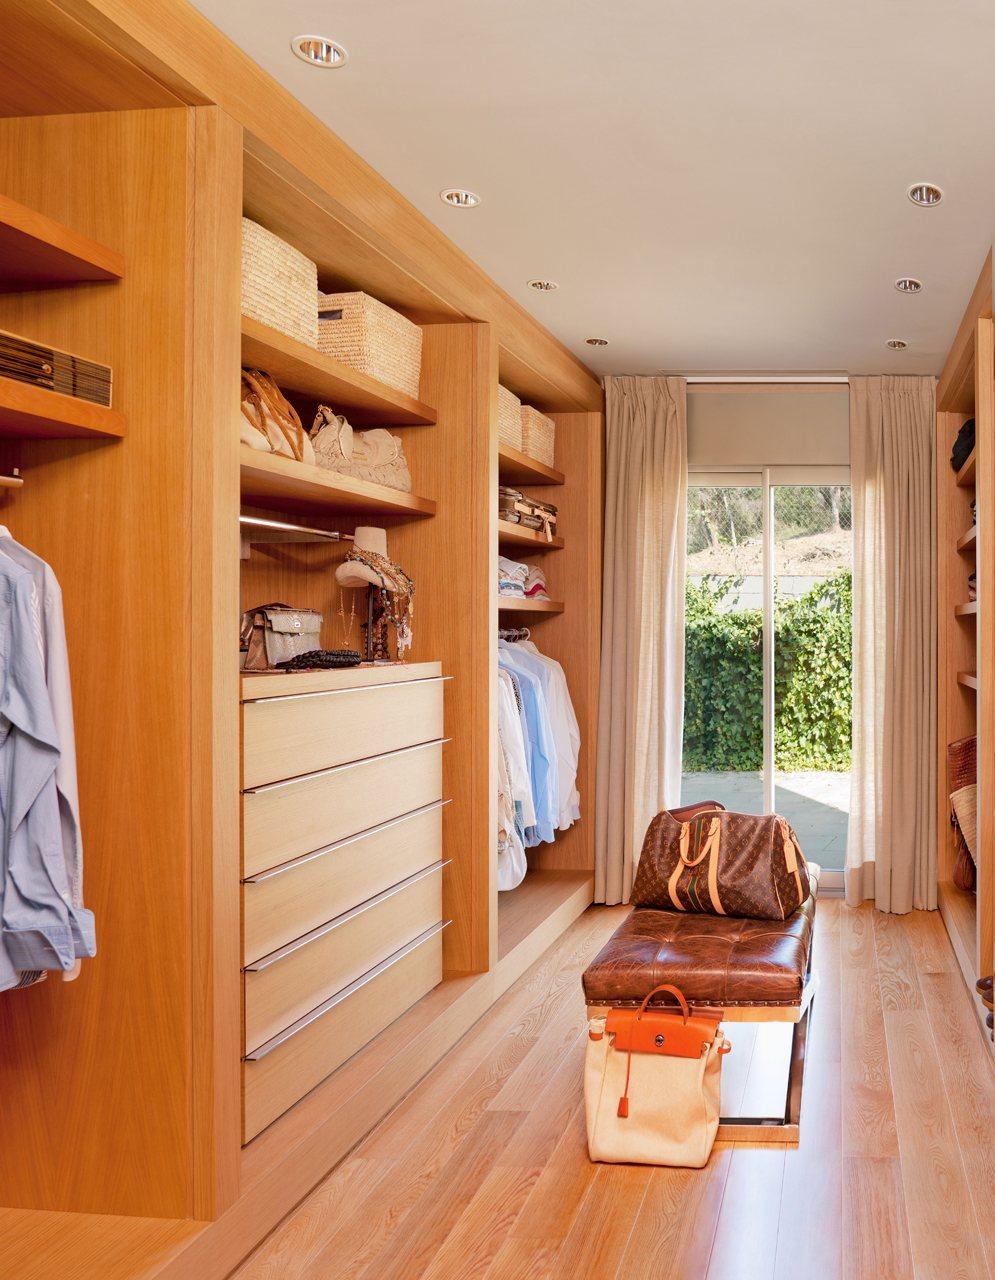 Ba o con vestidor medidas for Cuarto con walking closet